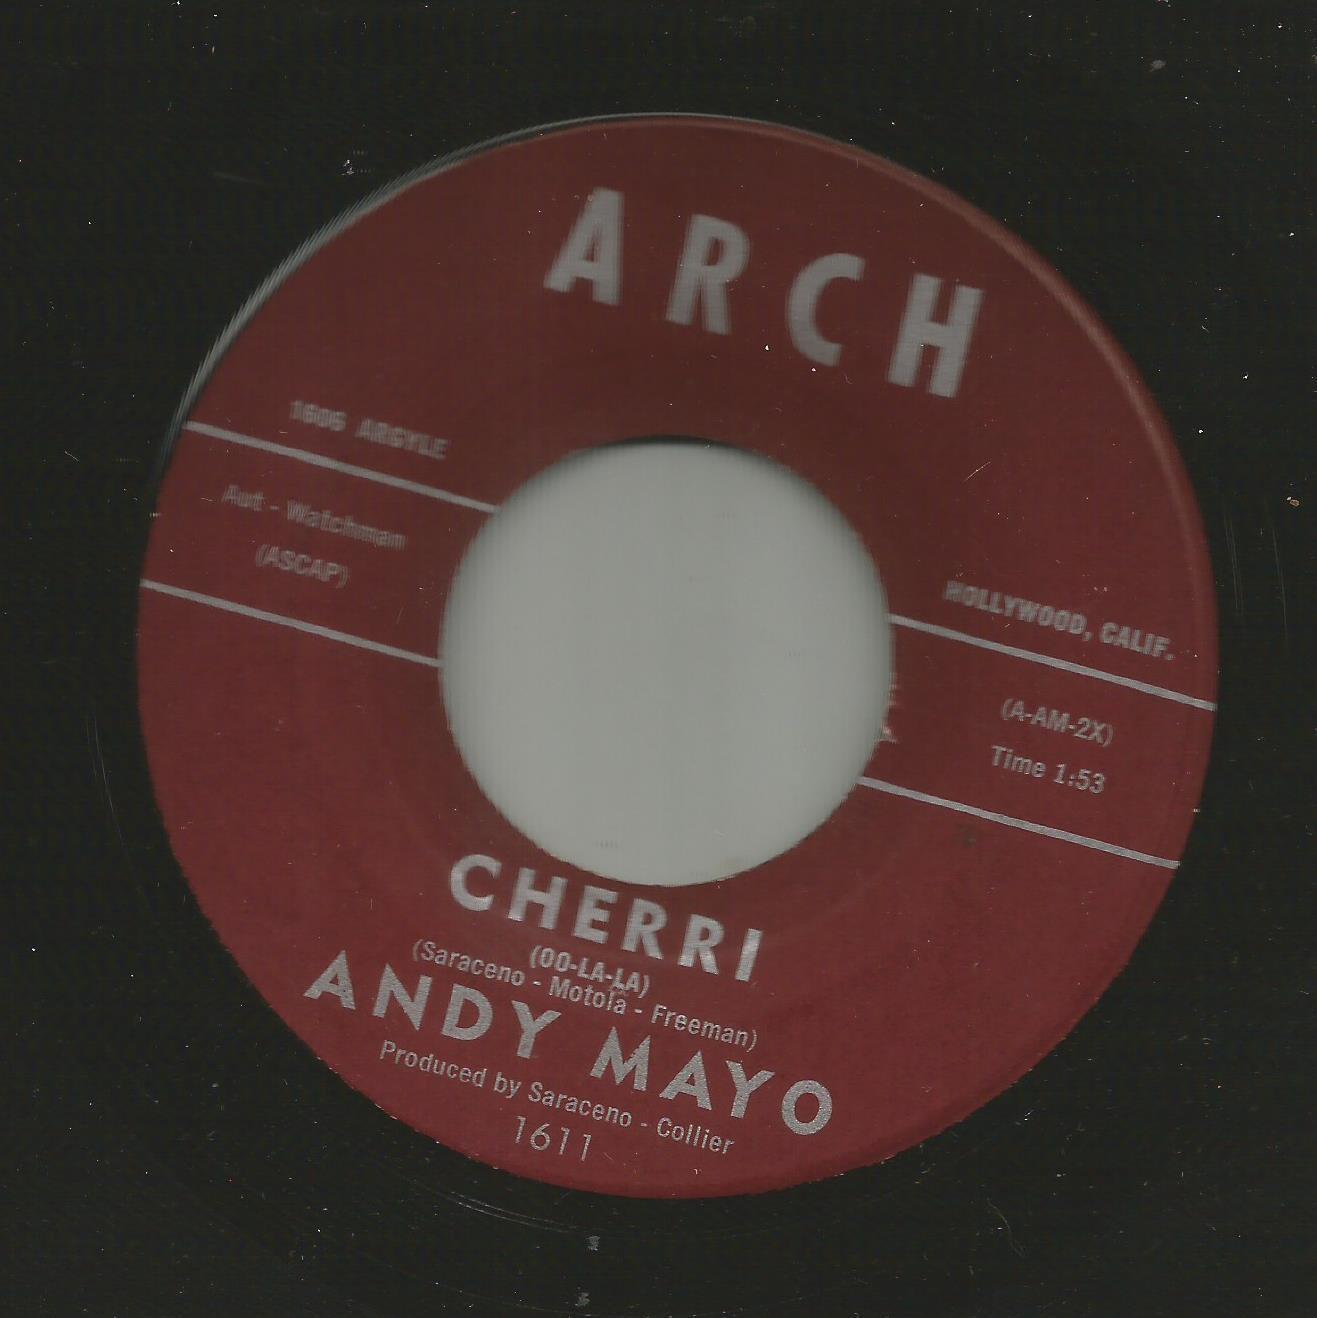 POPCORN TEEN DOOWOP- ANDY MAYO  - CHERRI  -HEAR -on ARCH